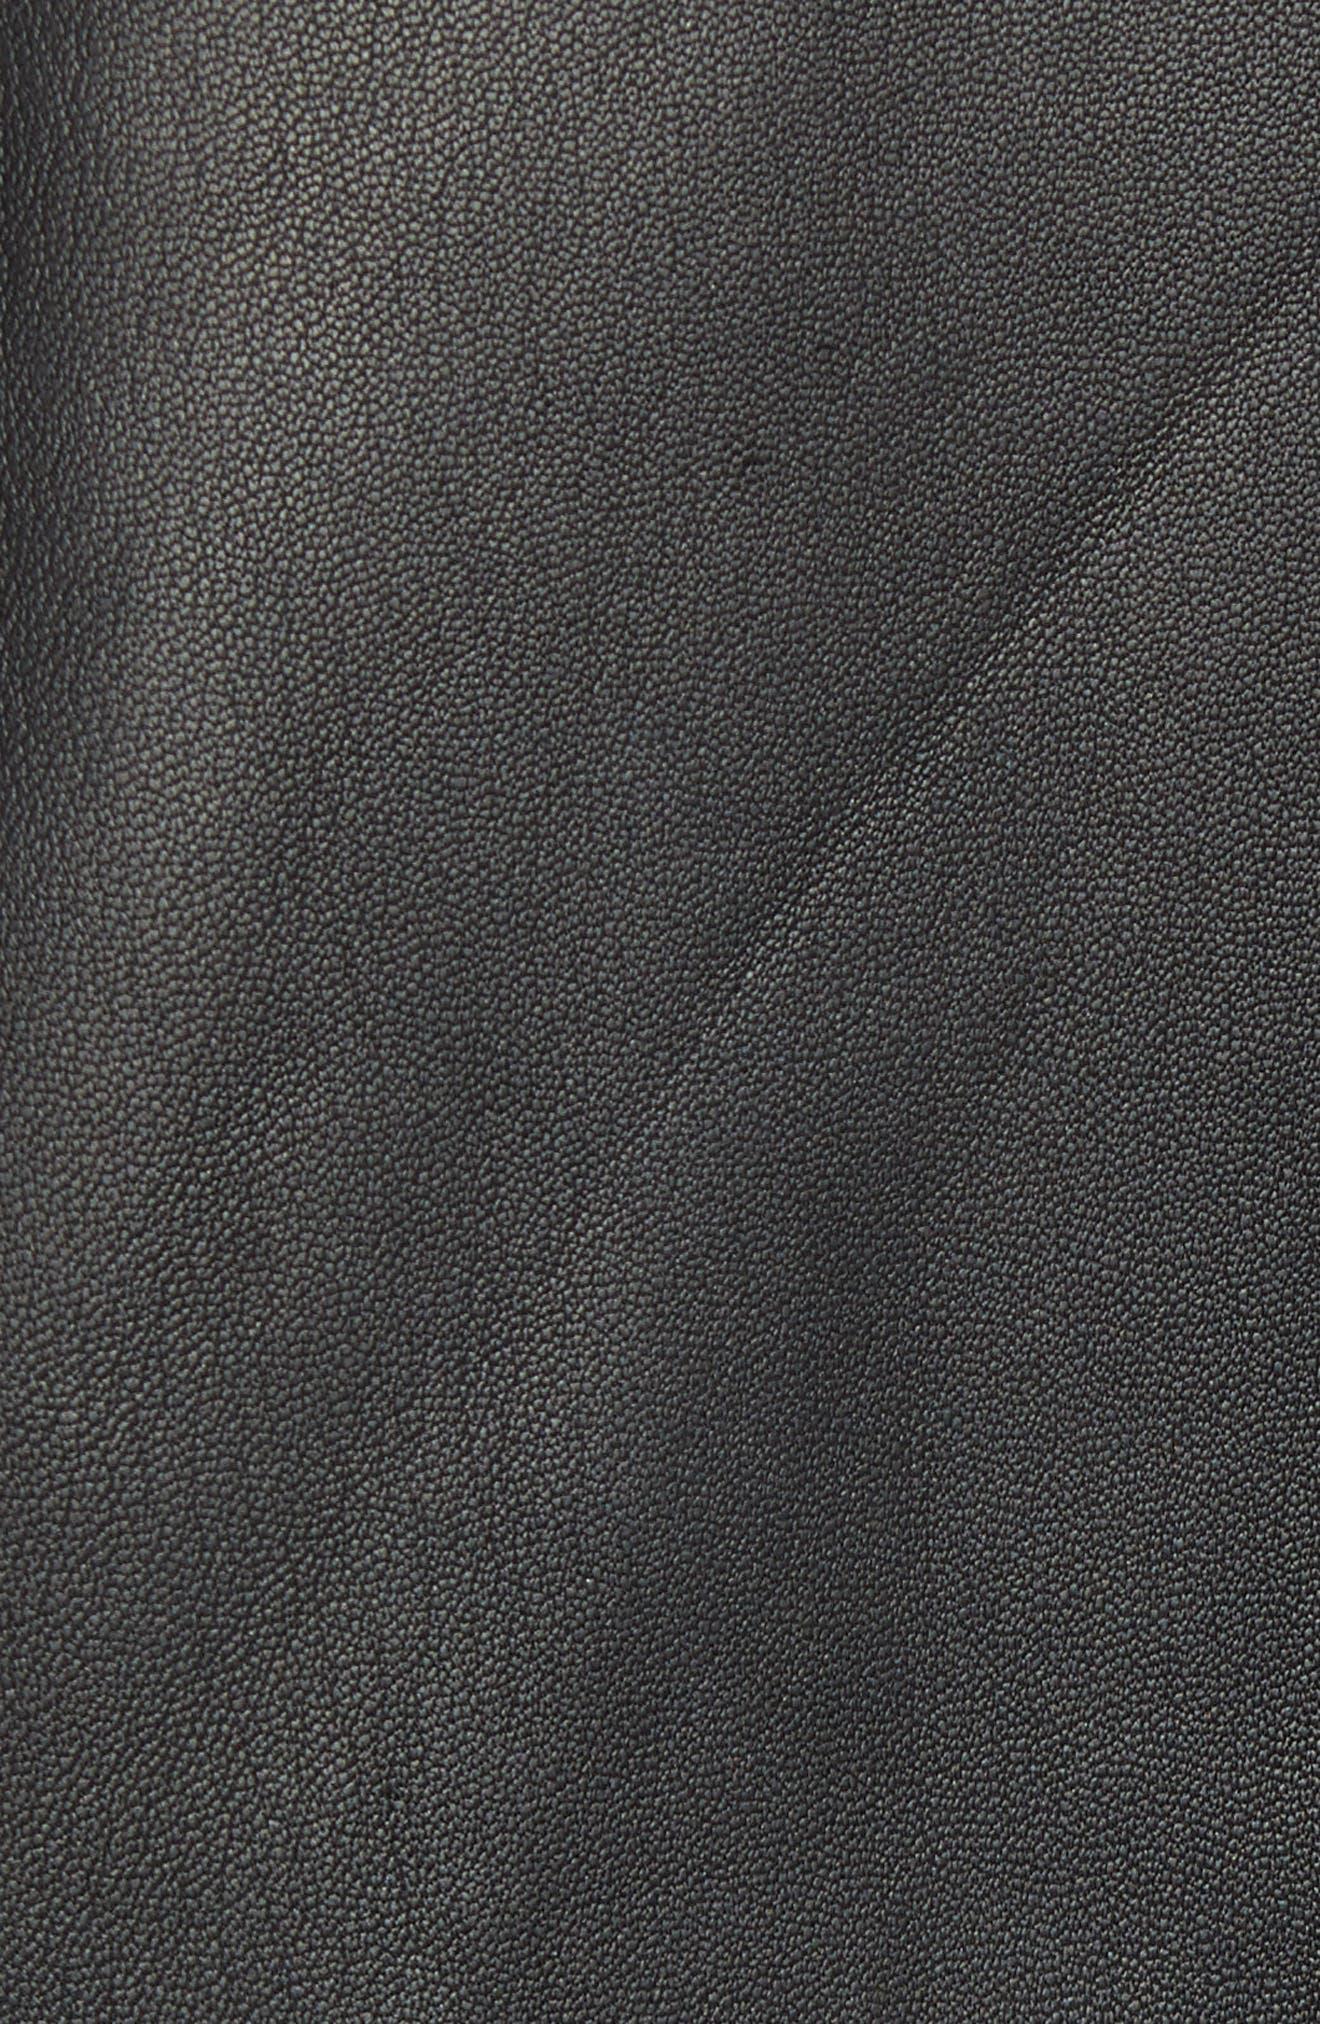 Morvek L.Burgos Trim Fit Leather Jacket,                             Alternate thumbnail 7, color,                             BLACK